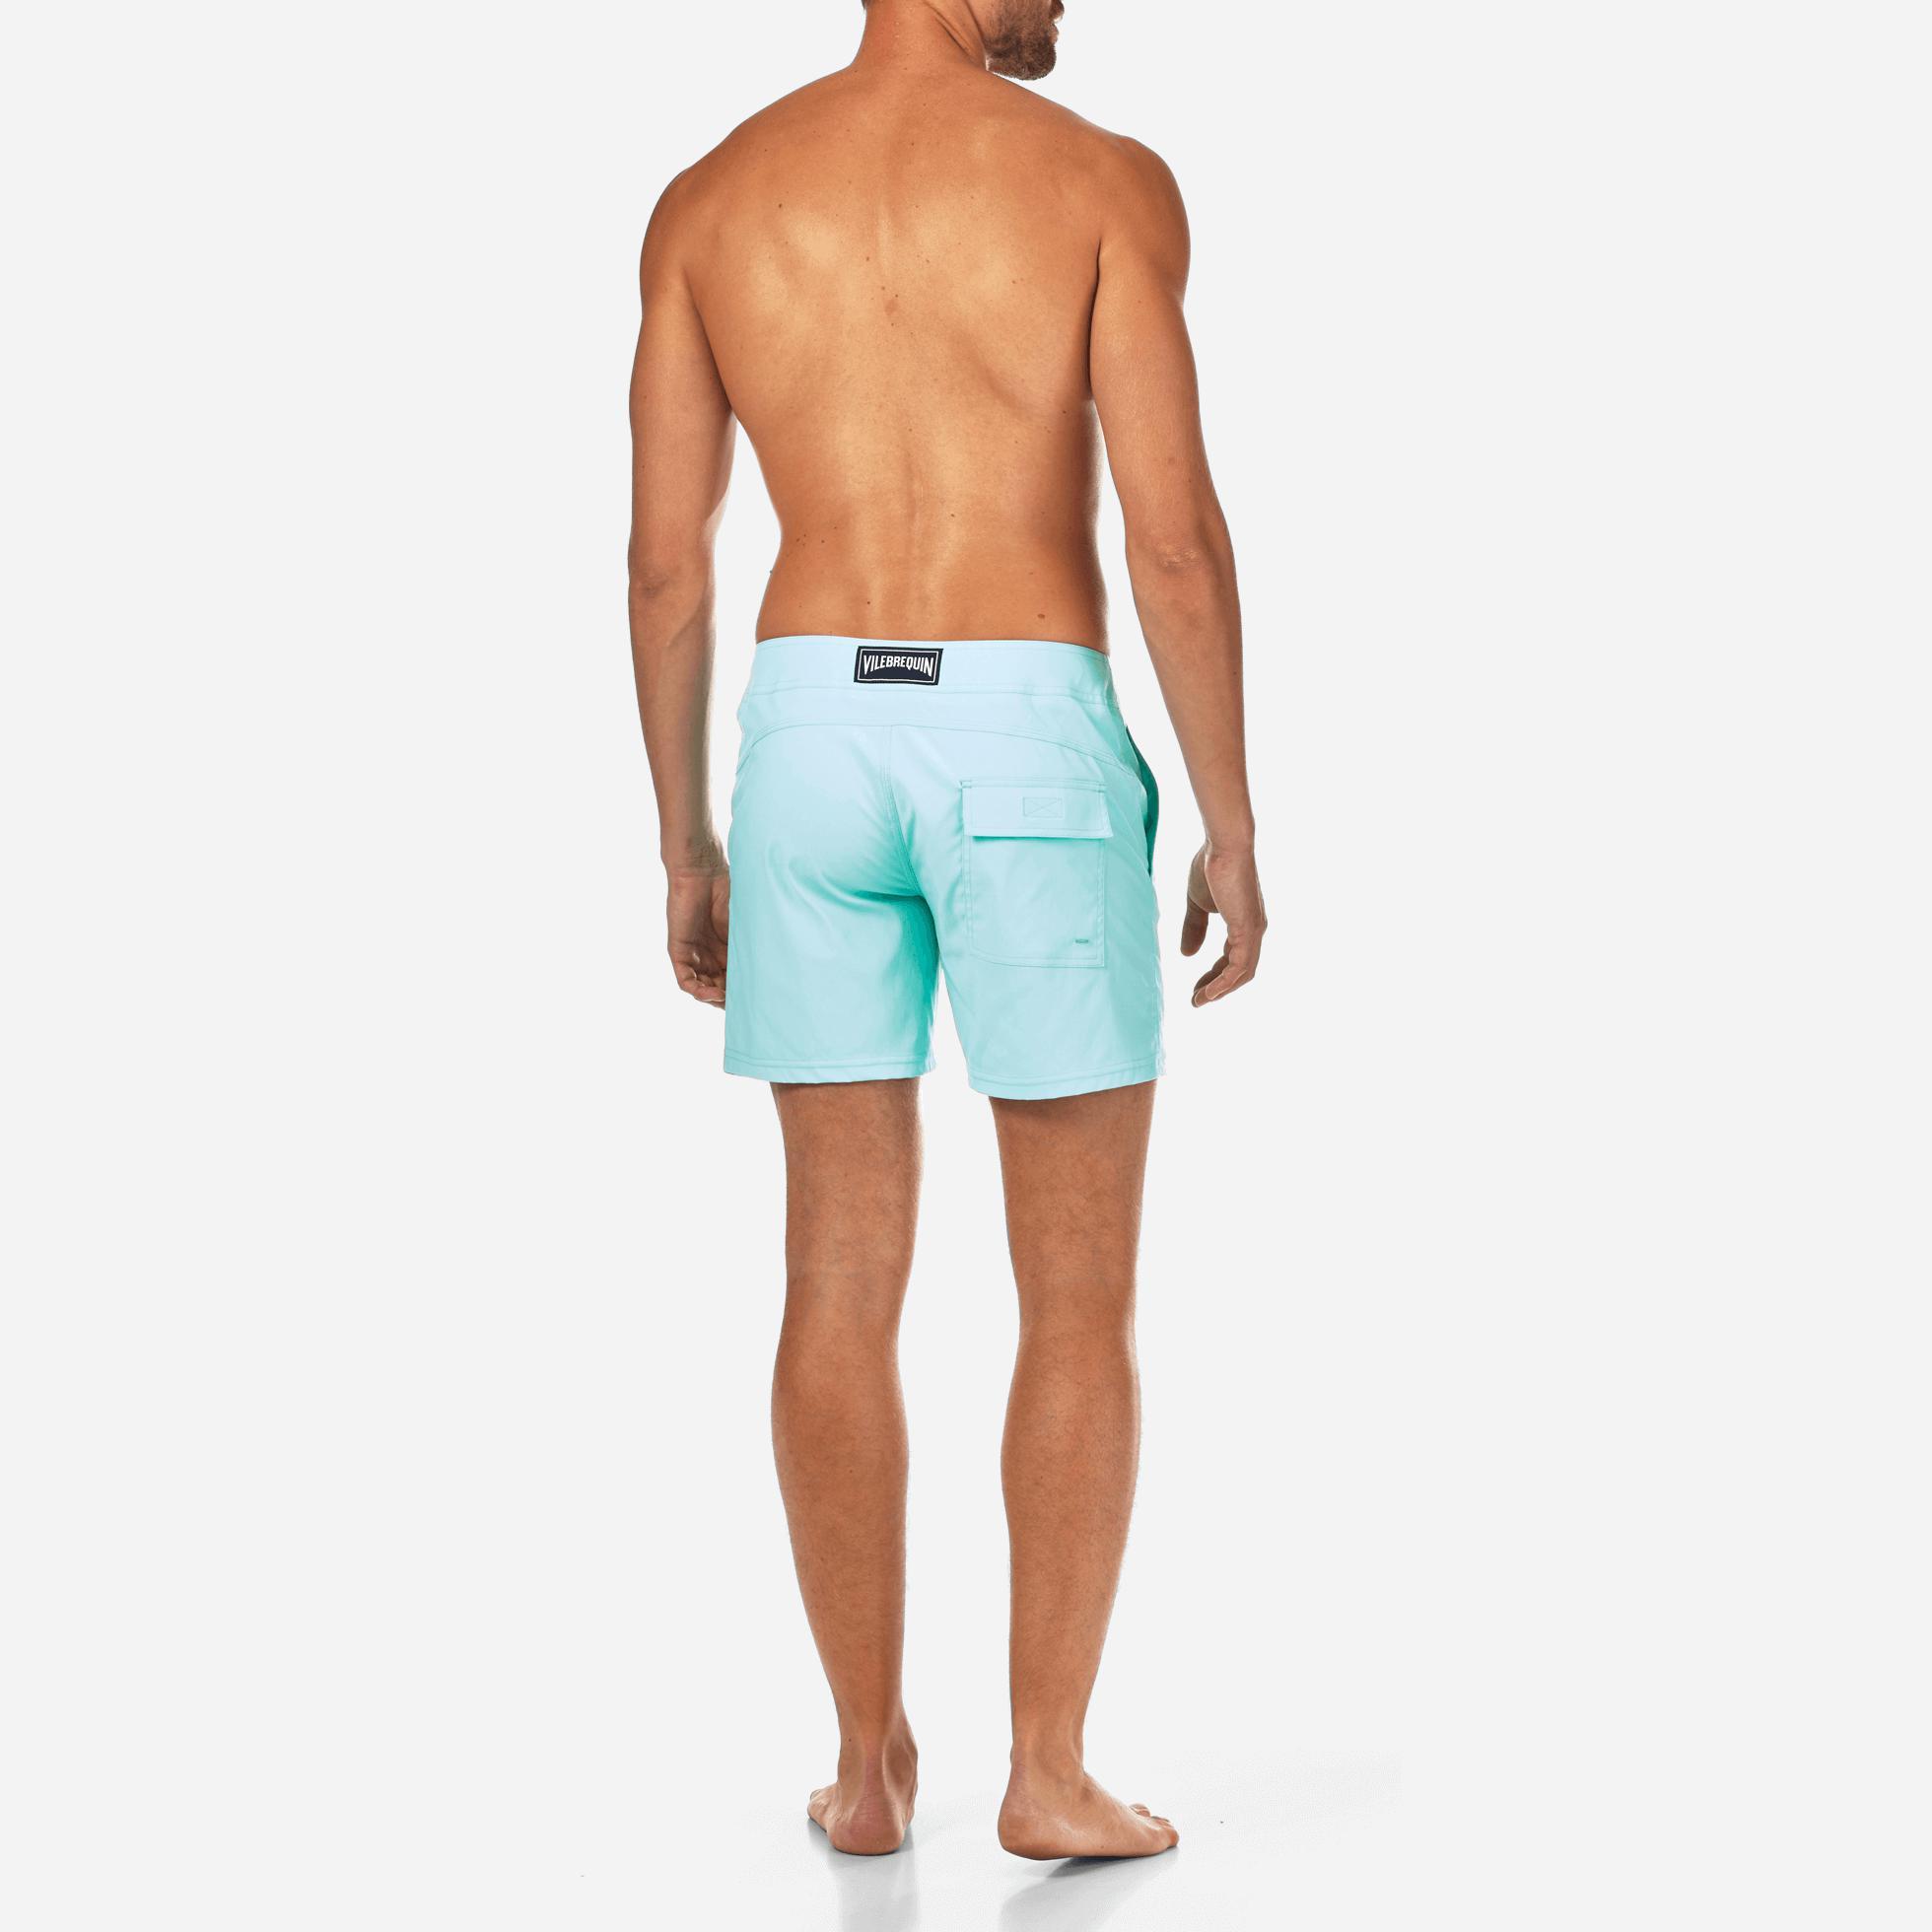 017bc7f317 Vilebrequin Men Flat Belt Stretch Swimwear Solid in Blue for Men - Lyst